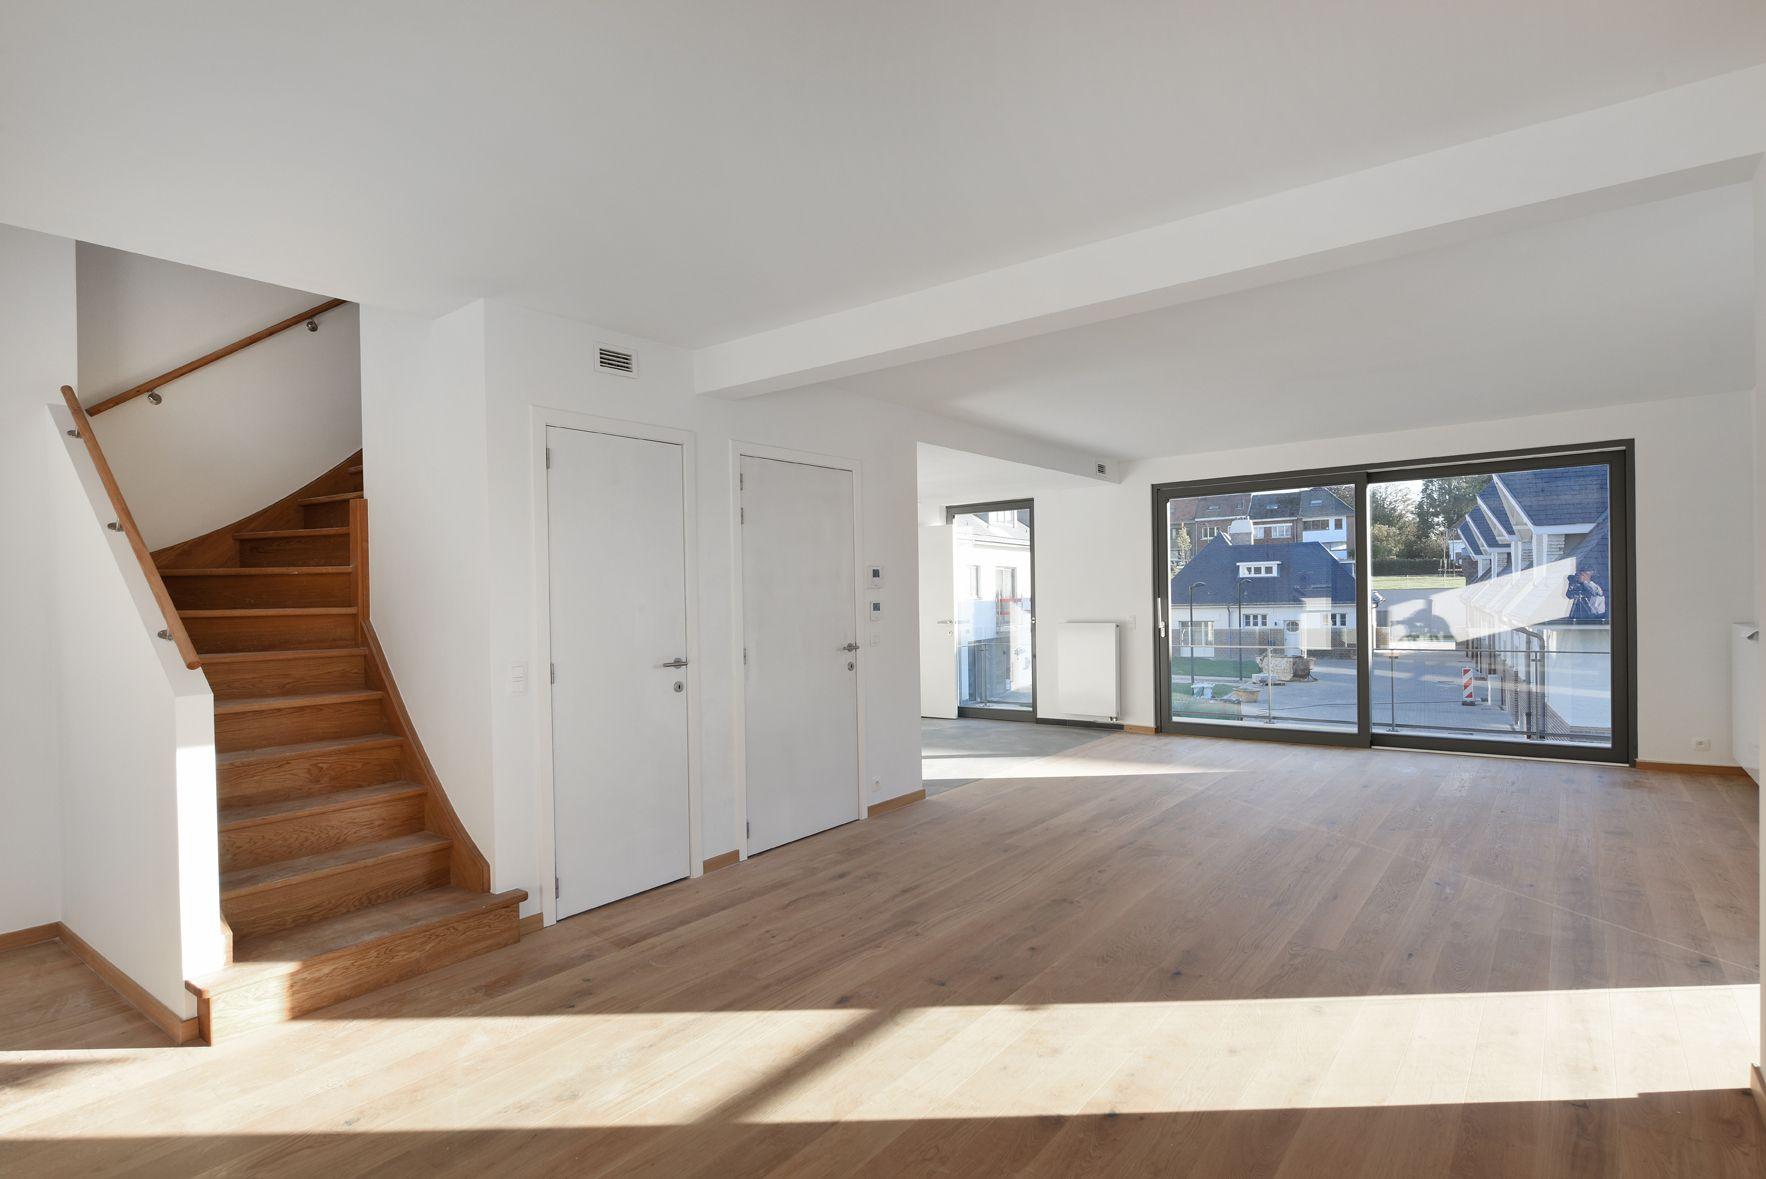 Pin By Fcm Architects On Bella Vita Waterloo Empty Room Design Room